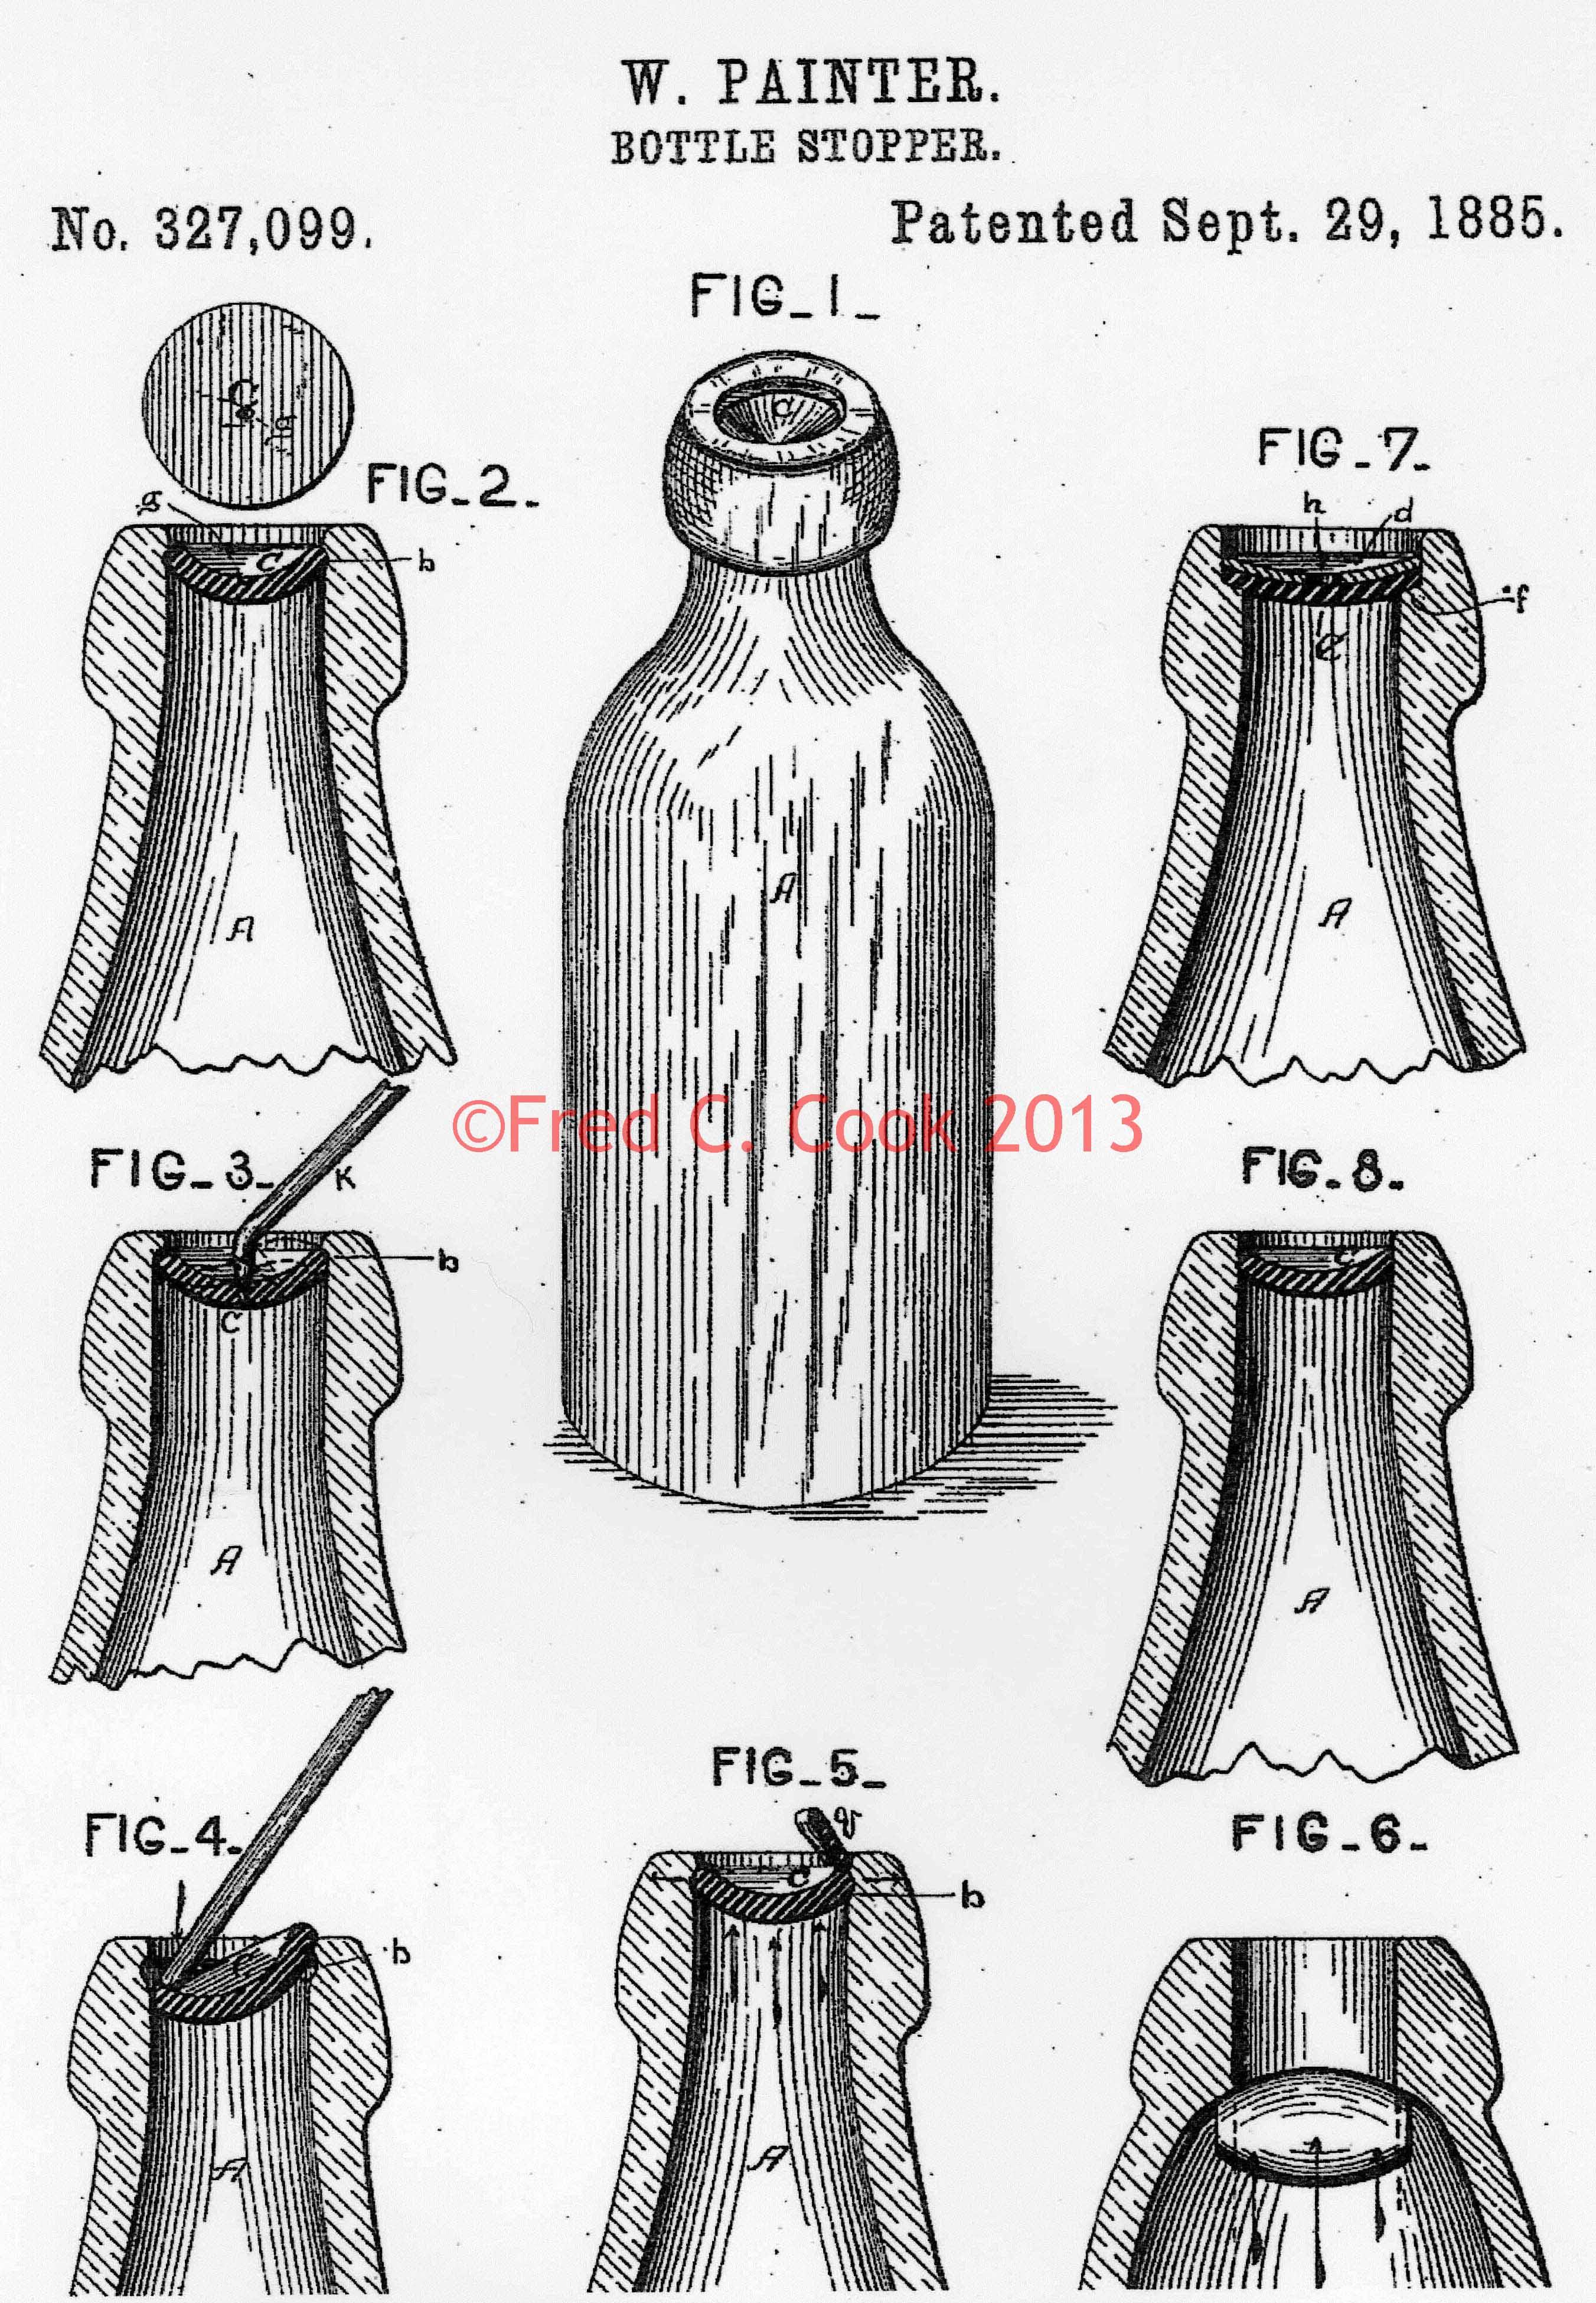 William Painter S Patent For The Baltimore Loop